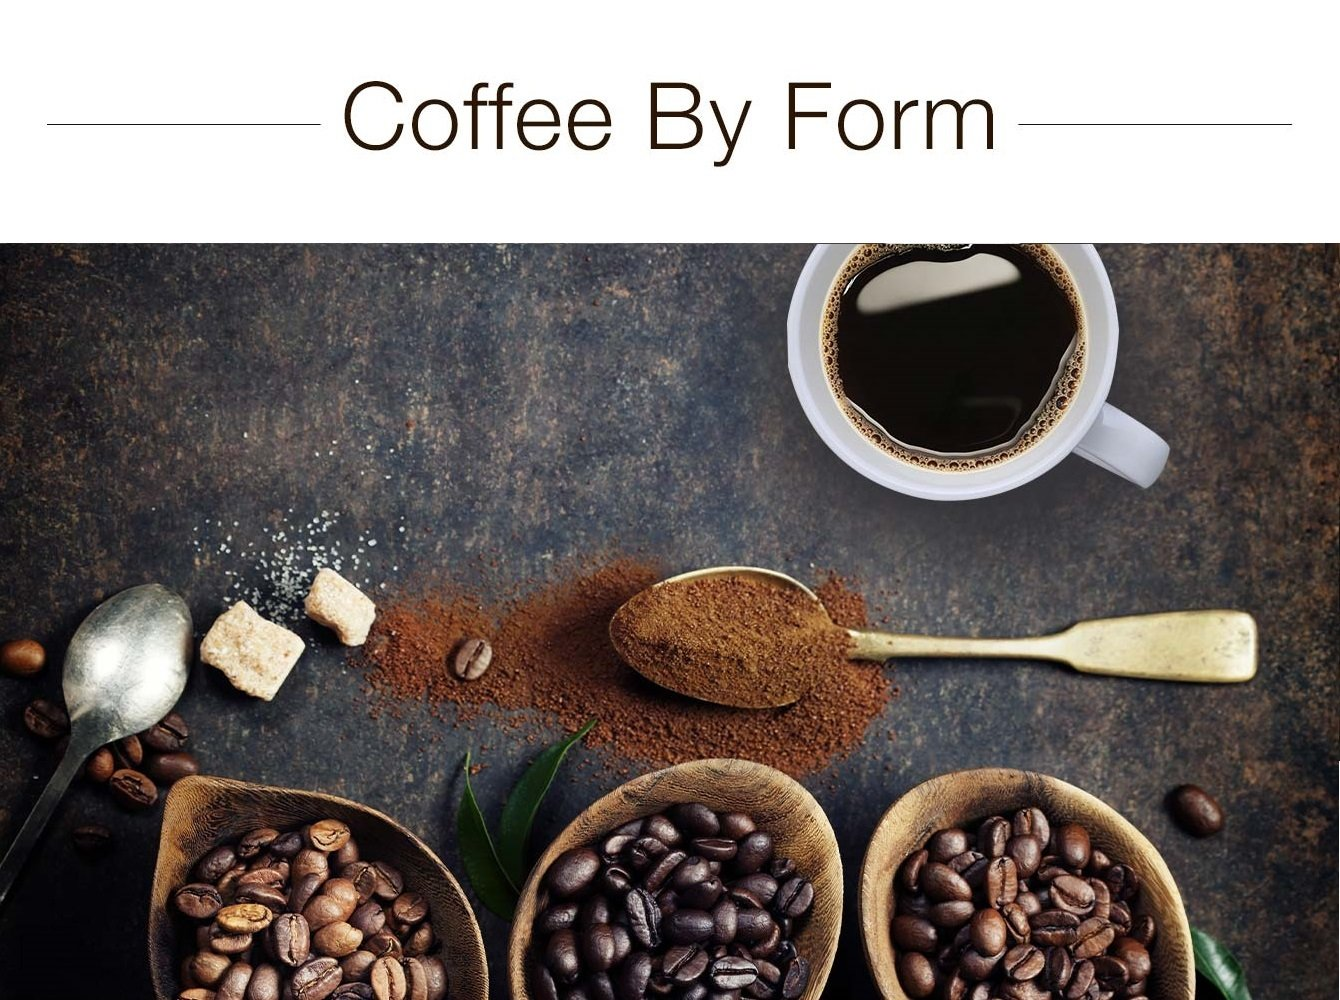 CoffeeByForm